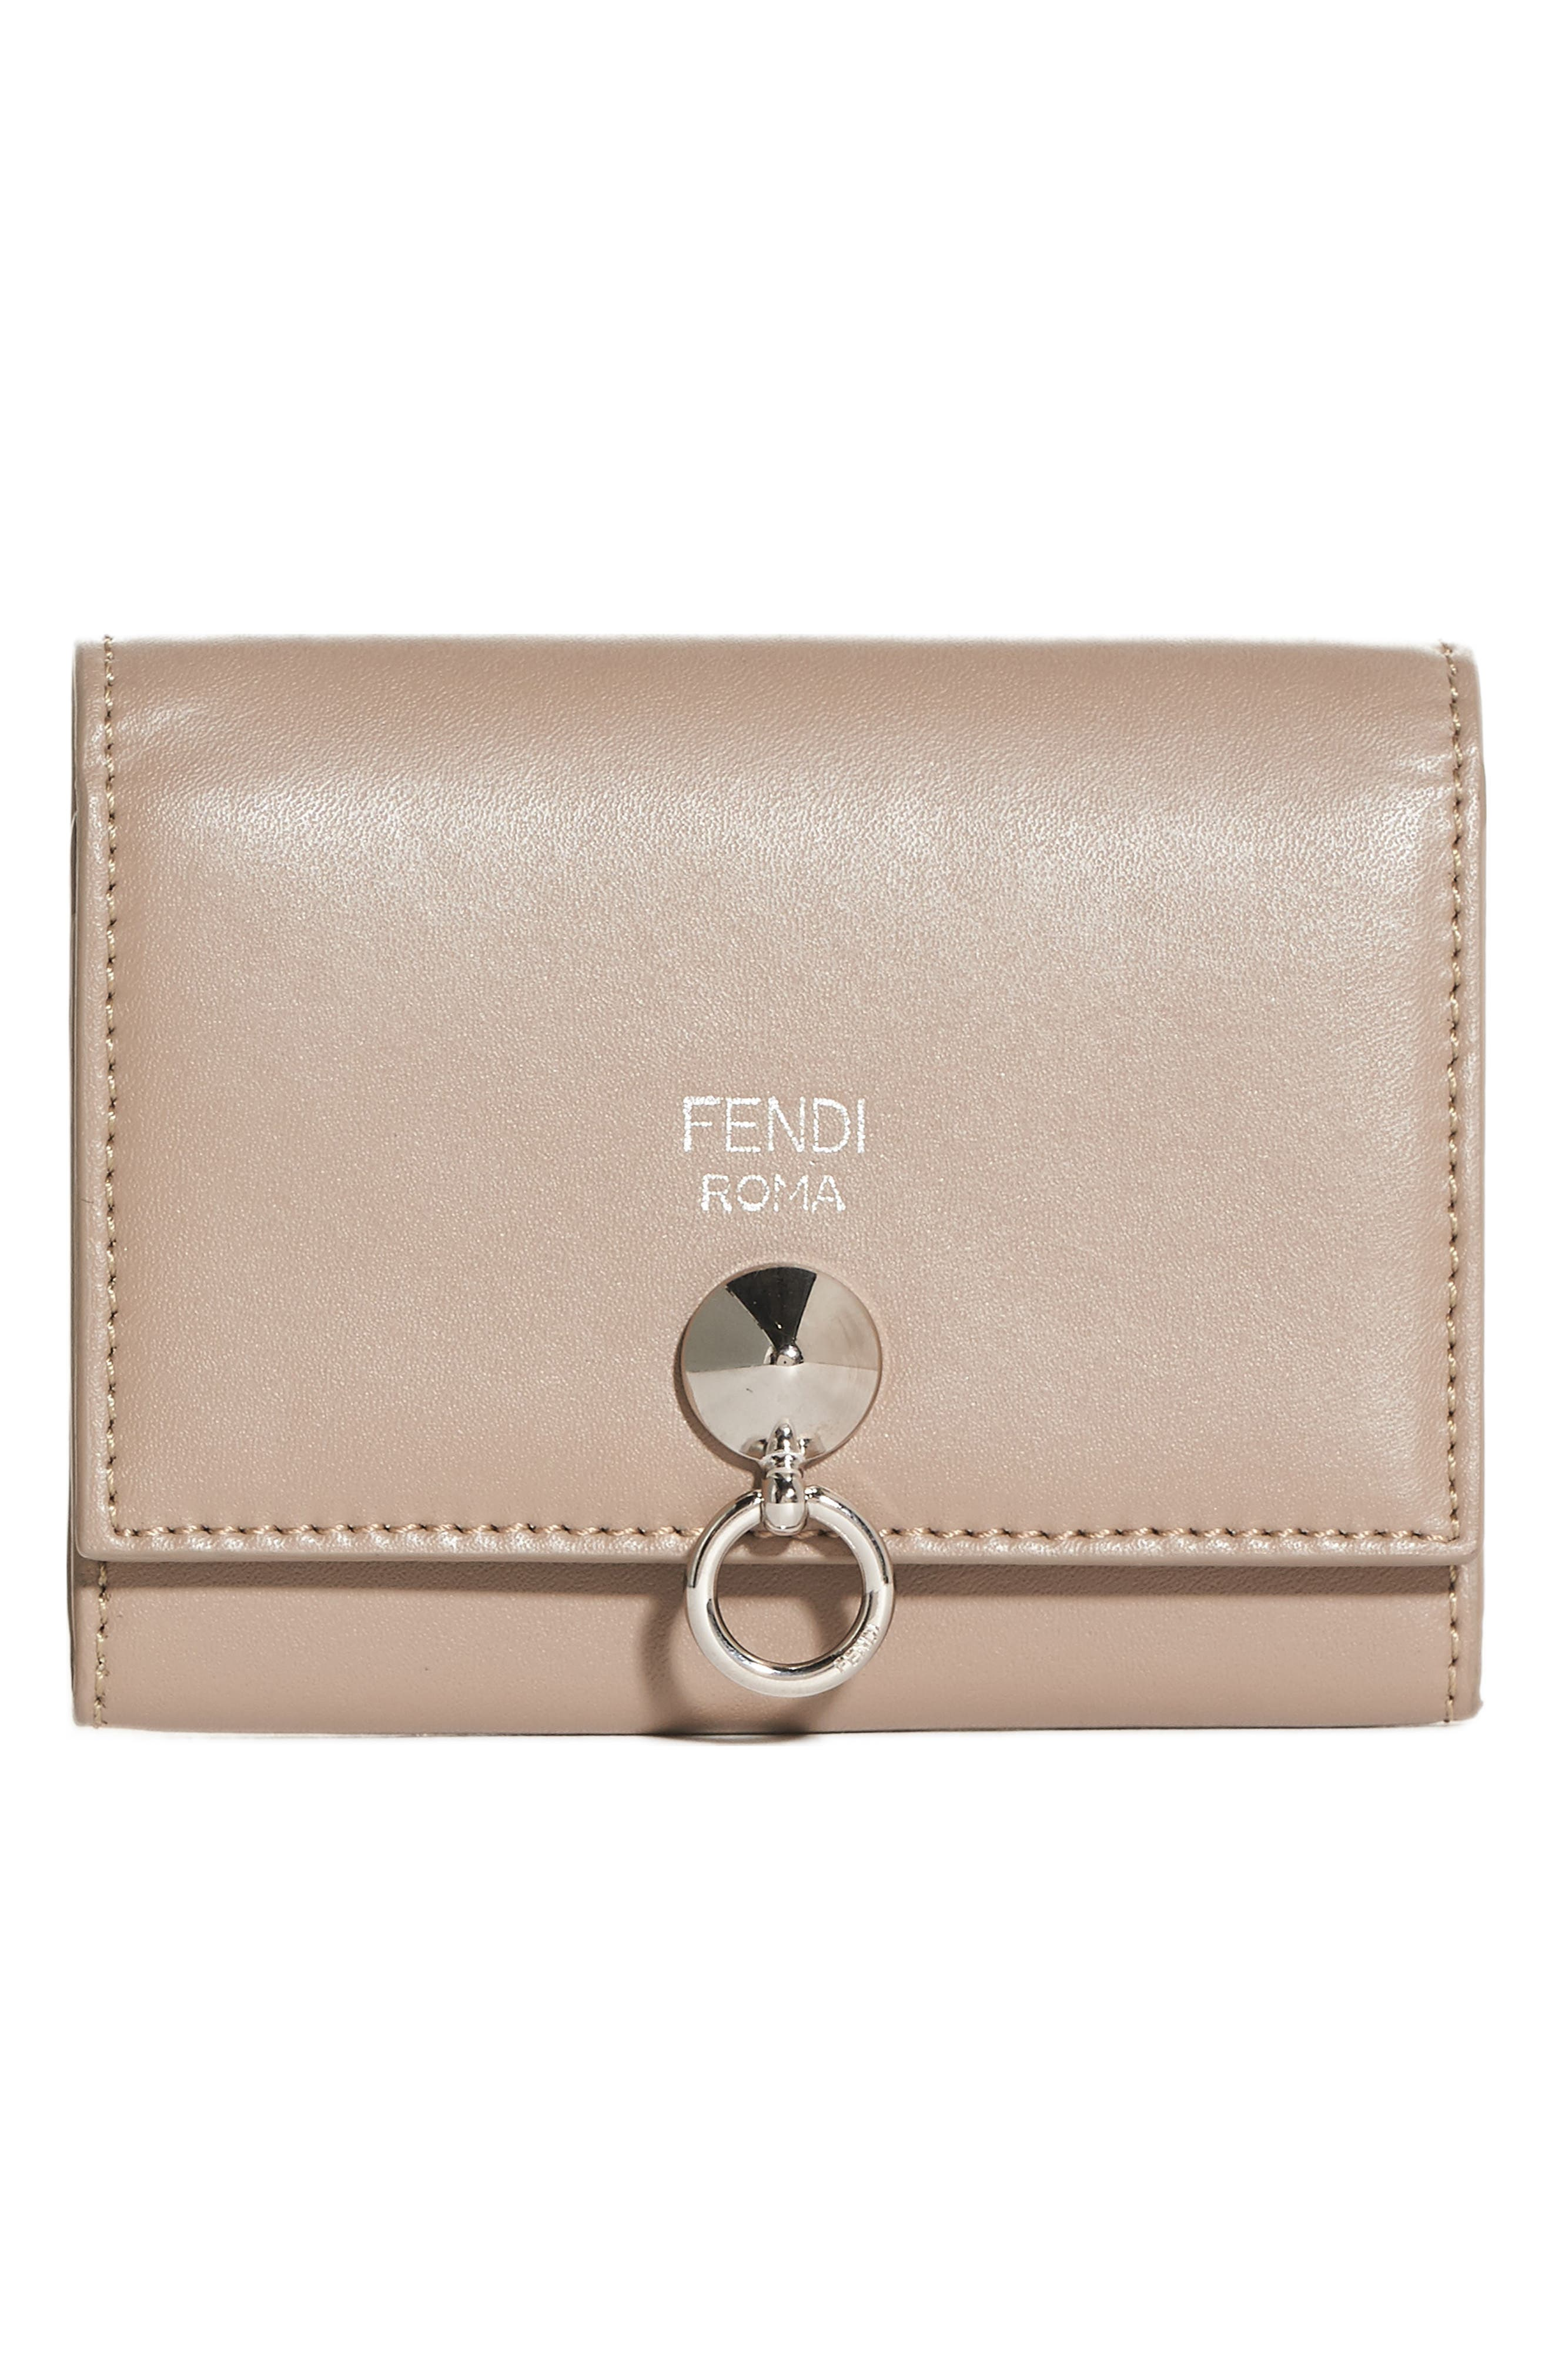 FENDI Leather Card Case